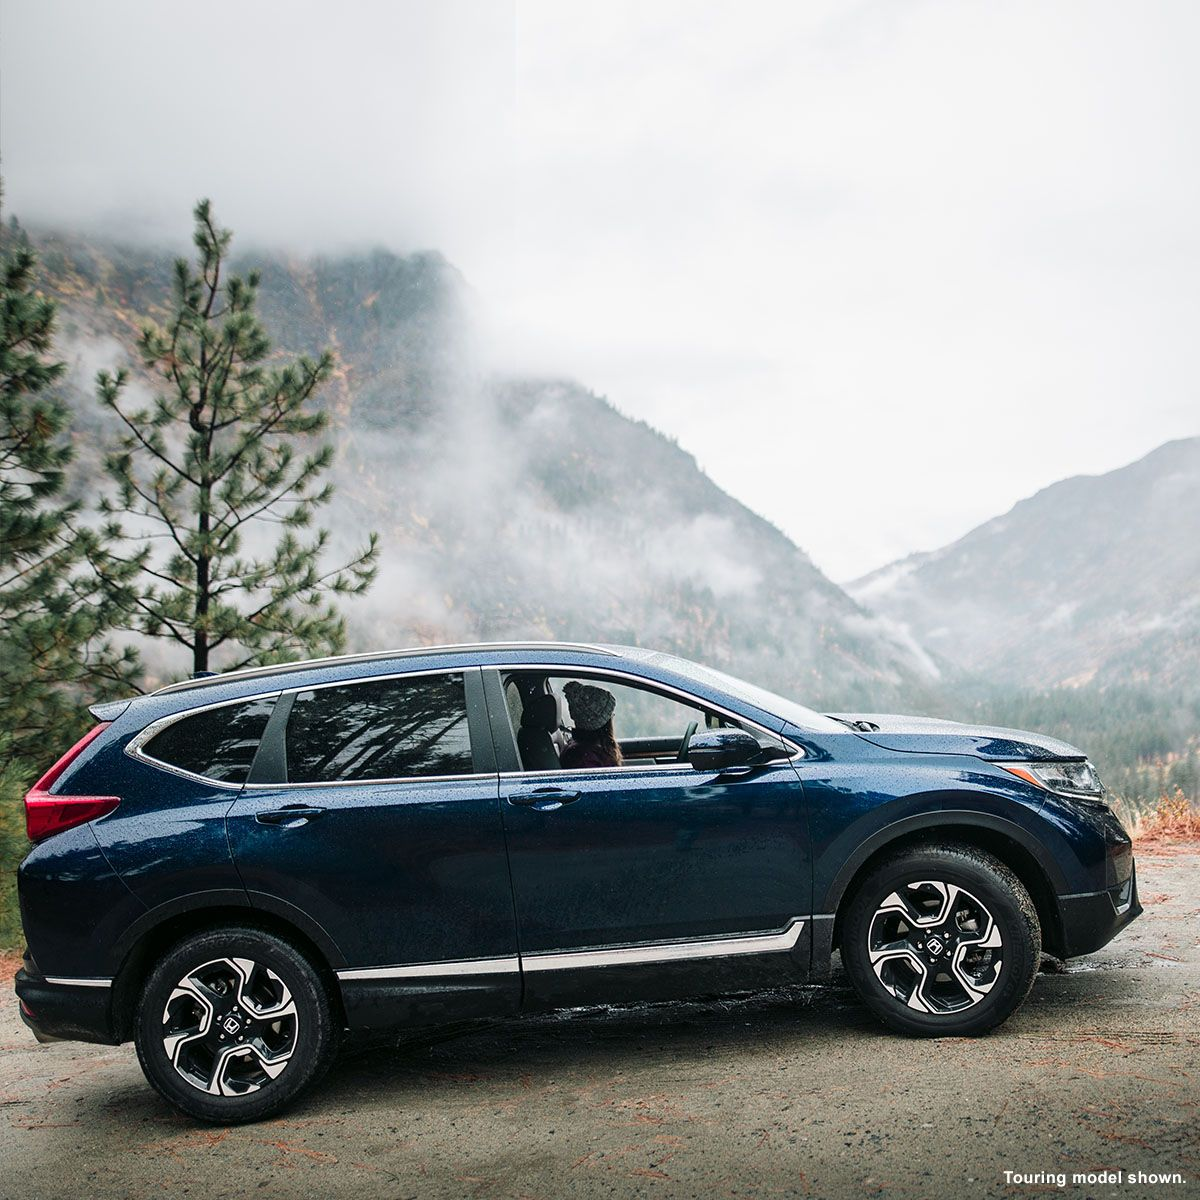 Adventure awaits in the adaptable 2018 Honda CRV with